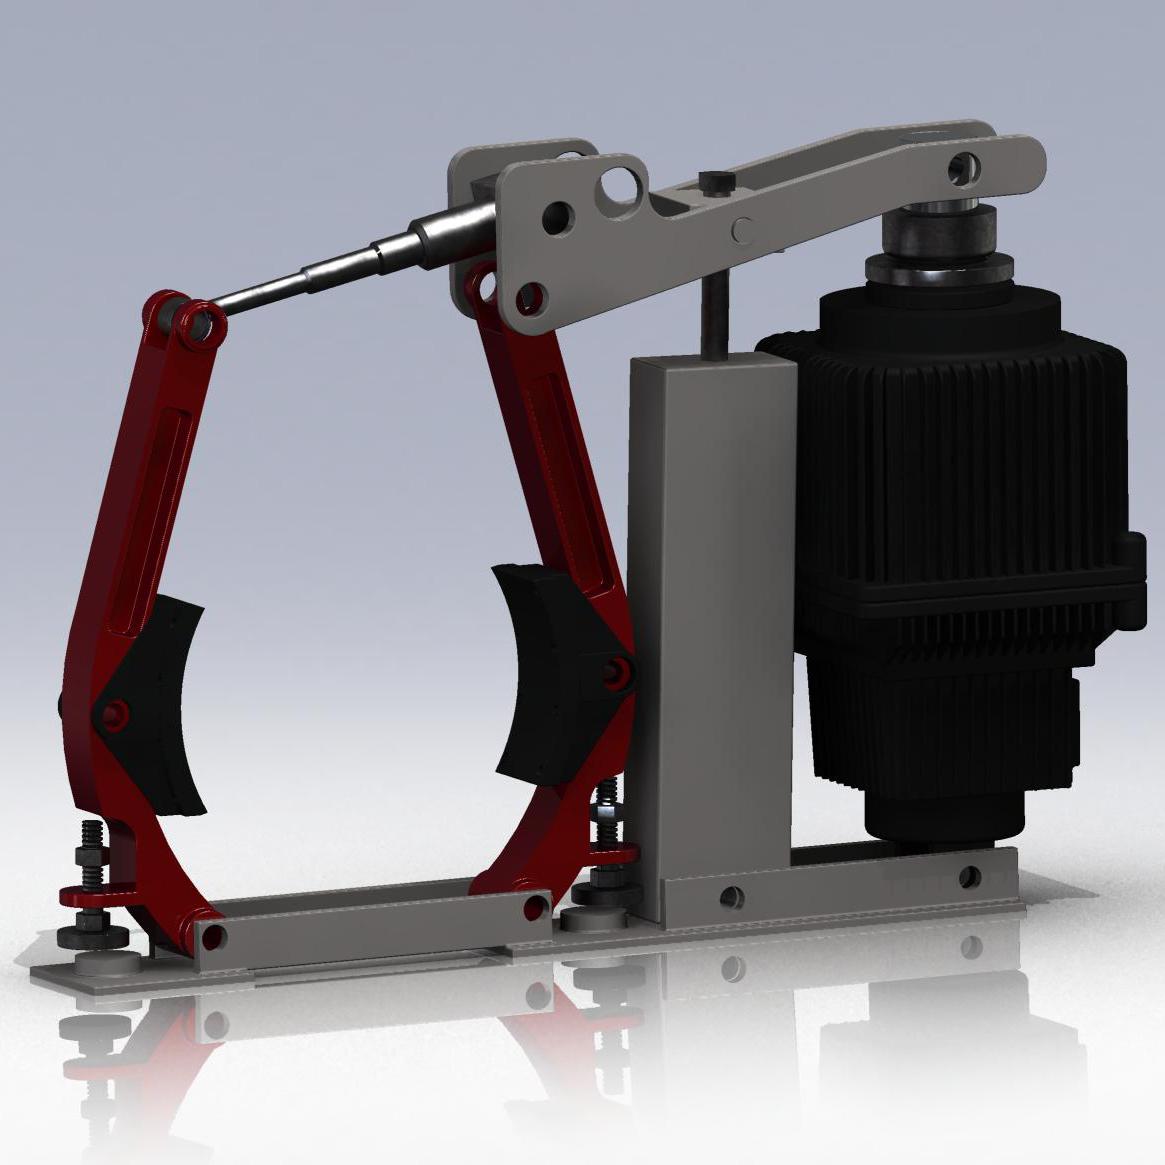 Детали машин 3D-модели Iges stp solid компас